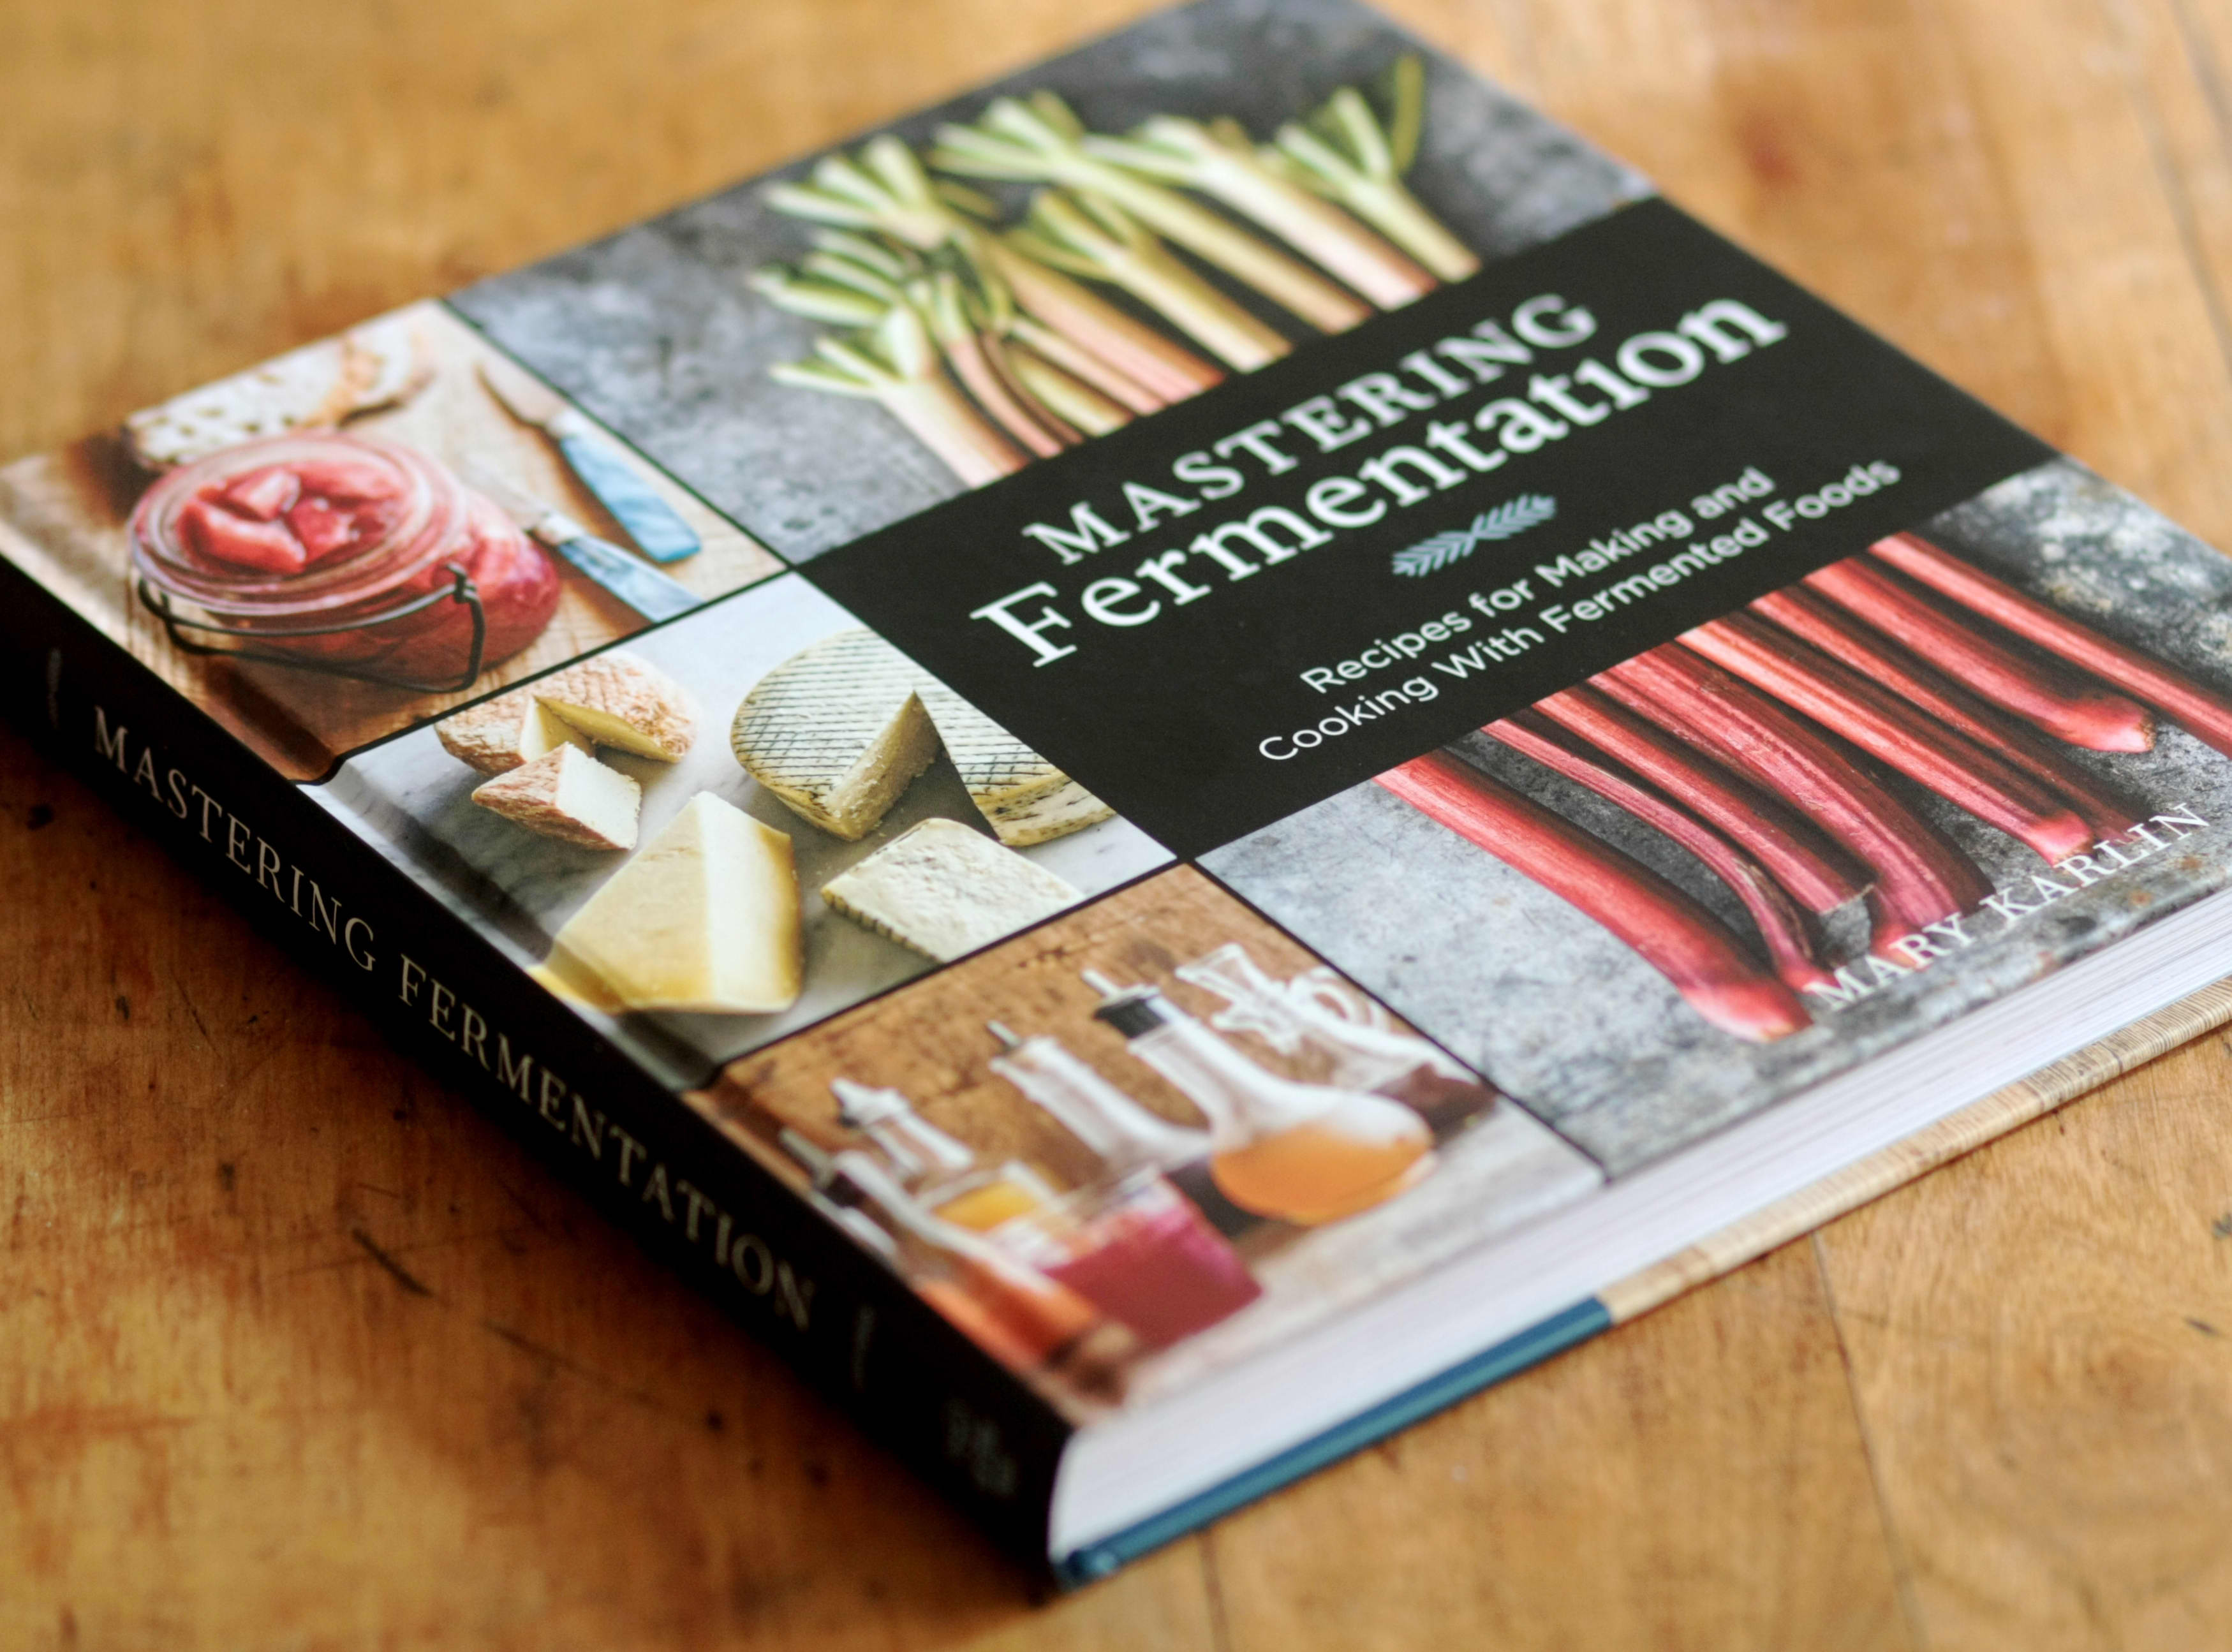 Mastering Fermentation by Mary Karlin